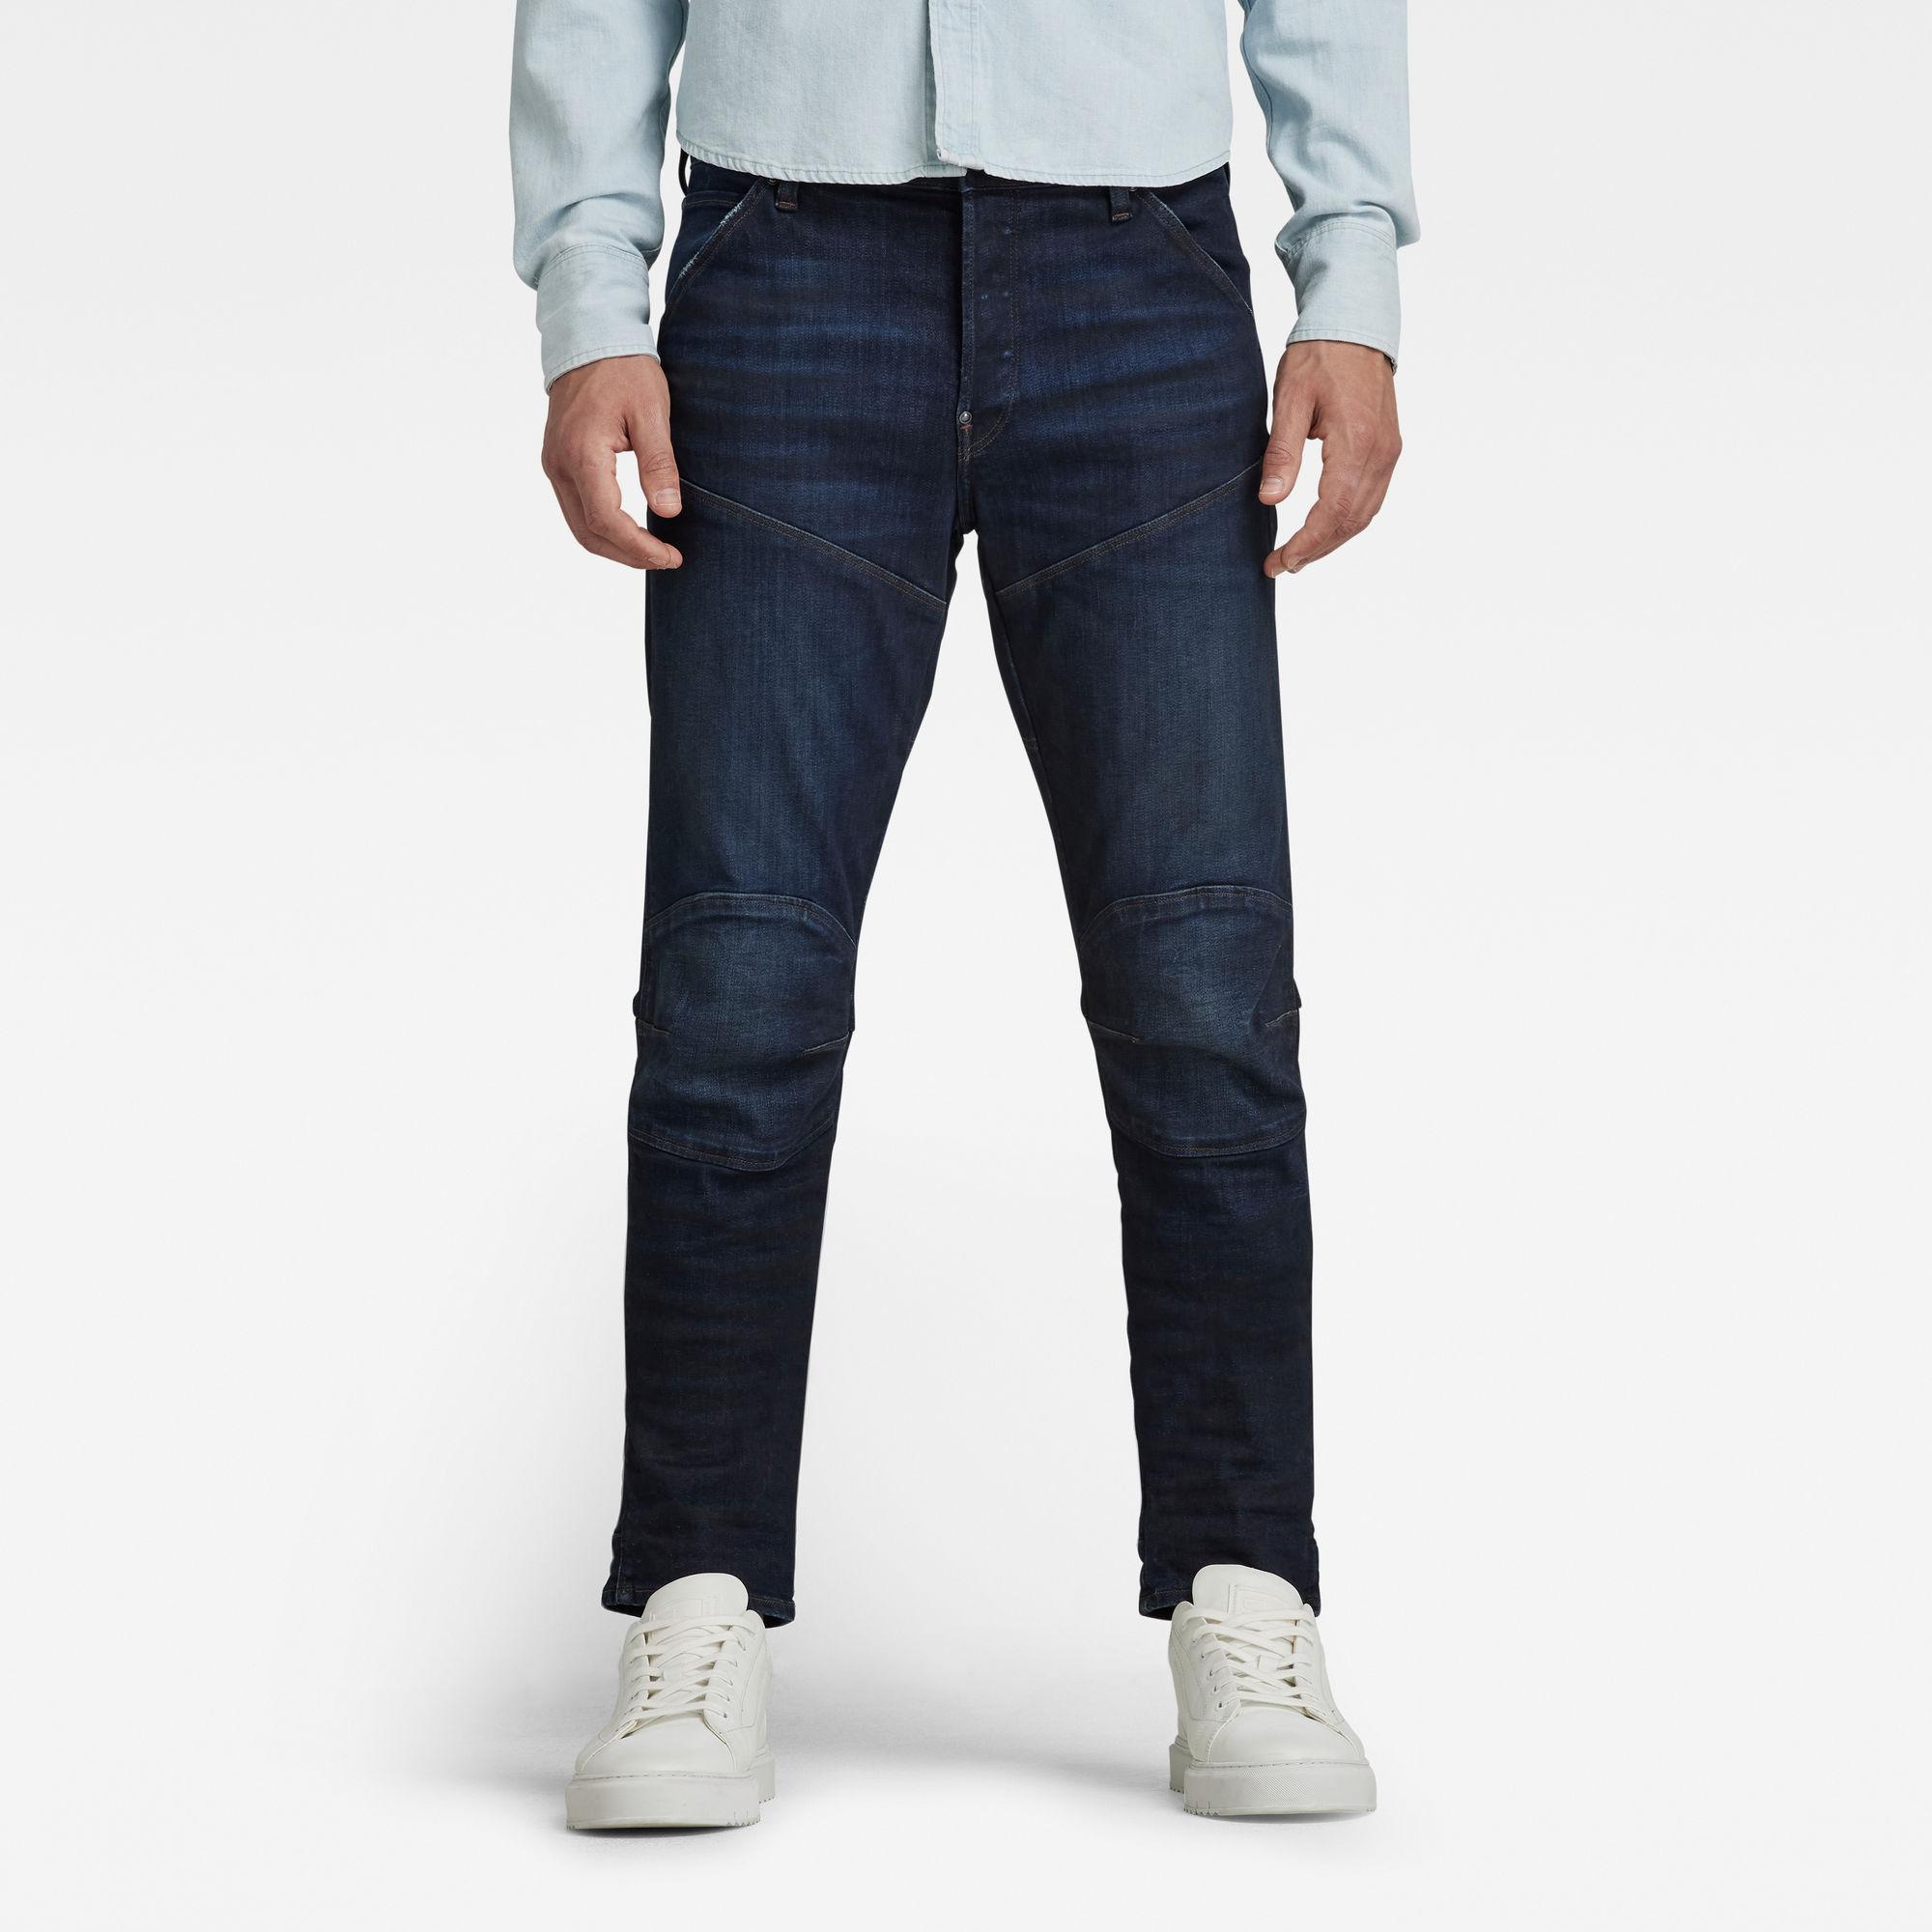 Van G Star Raw 5620 G-Star Elwood 3D Slim Jeans Prijsvergelijk nu!